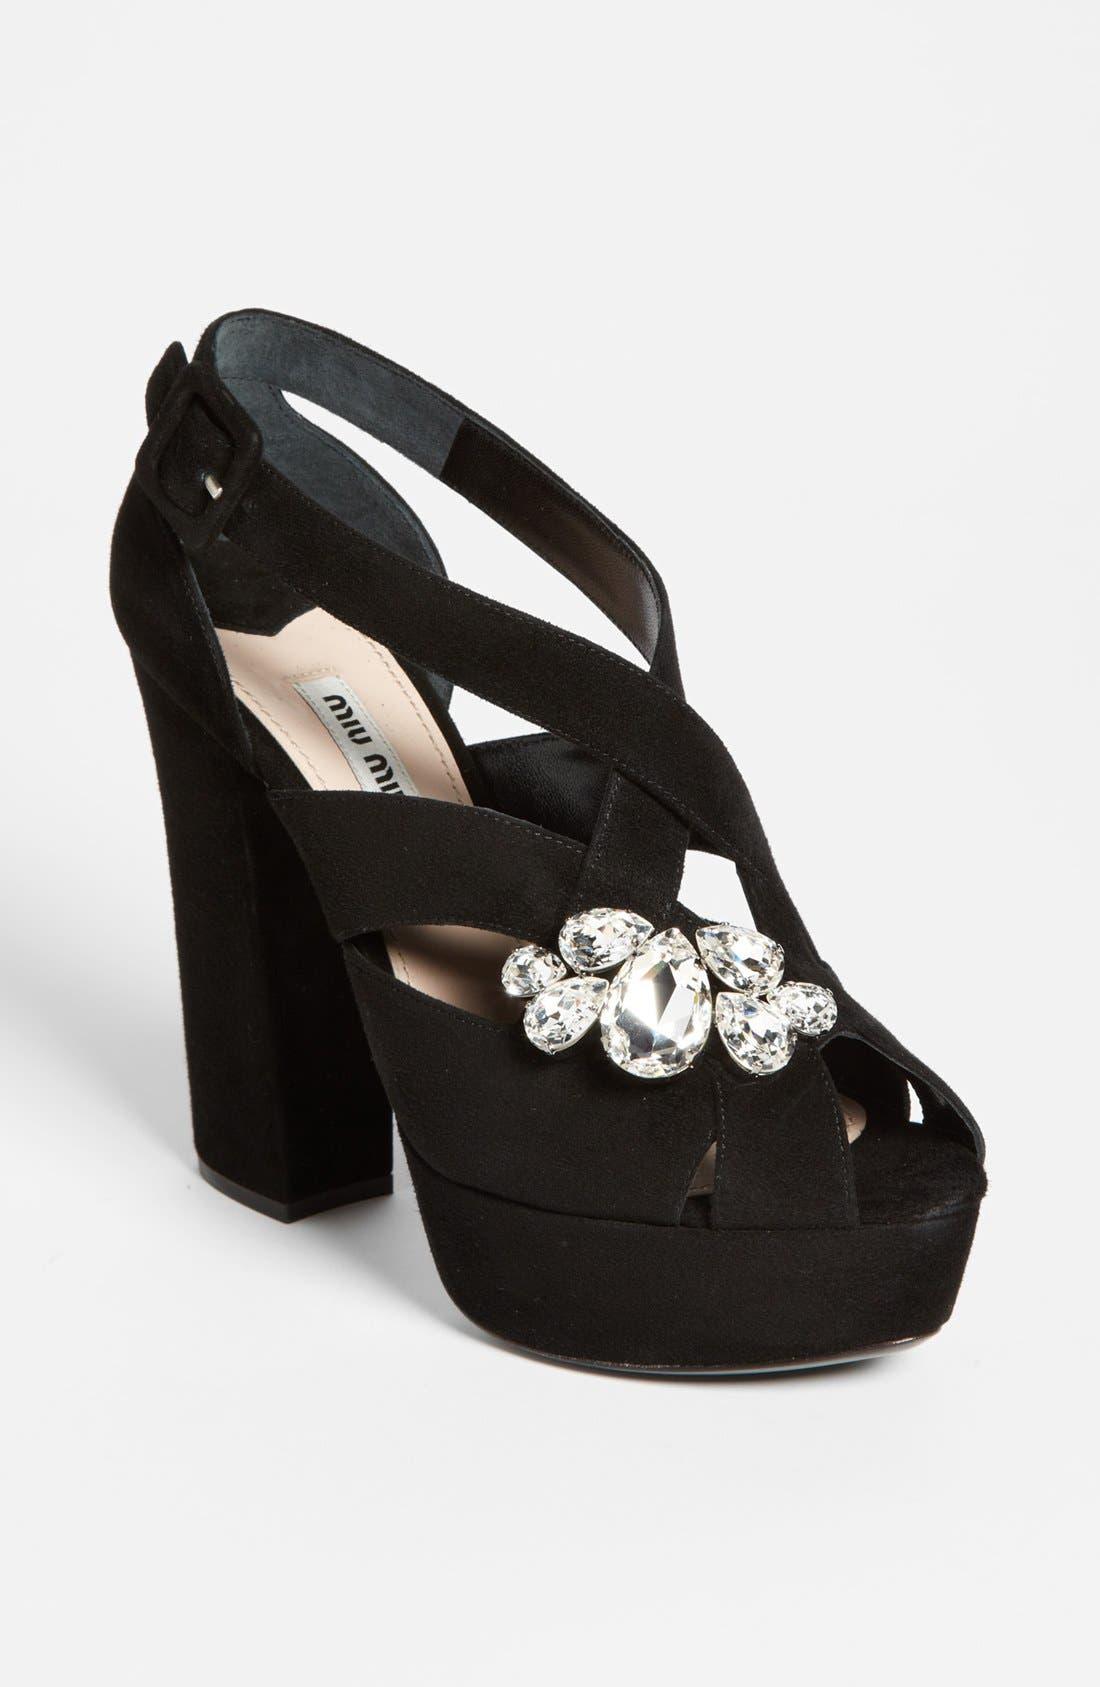 Alternate Image 1 Selected - Miu Miu Jewel Platform Sandal